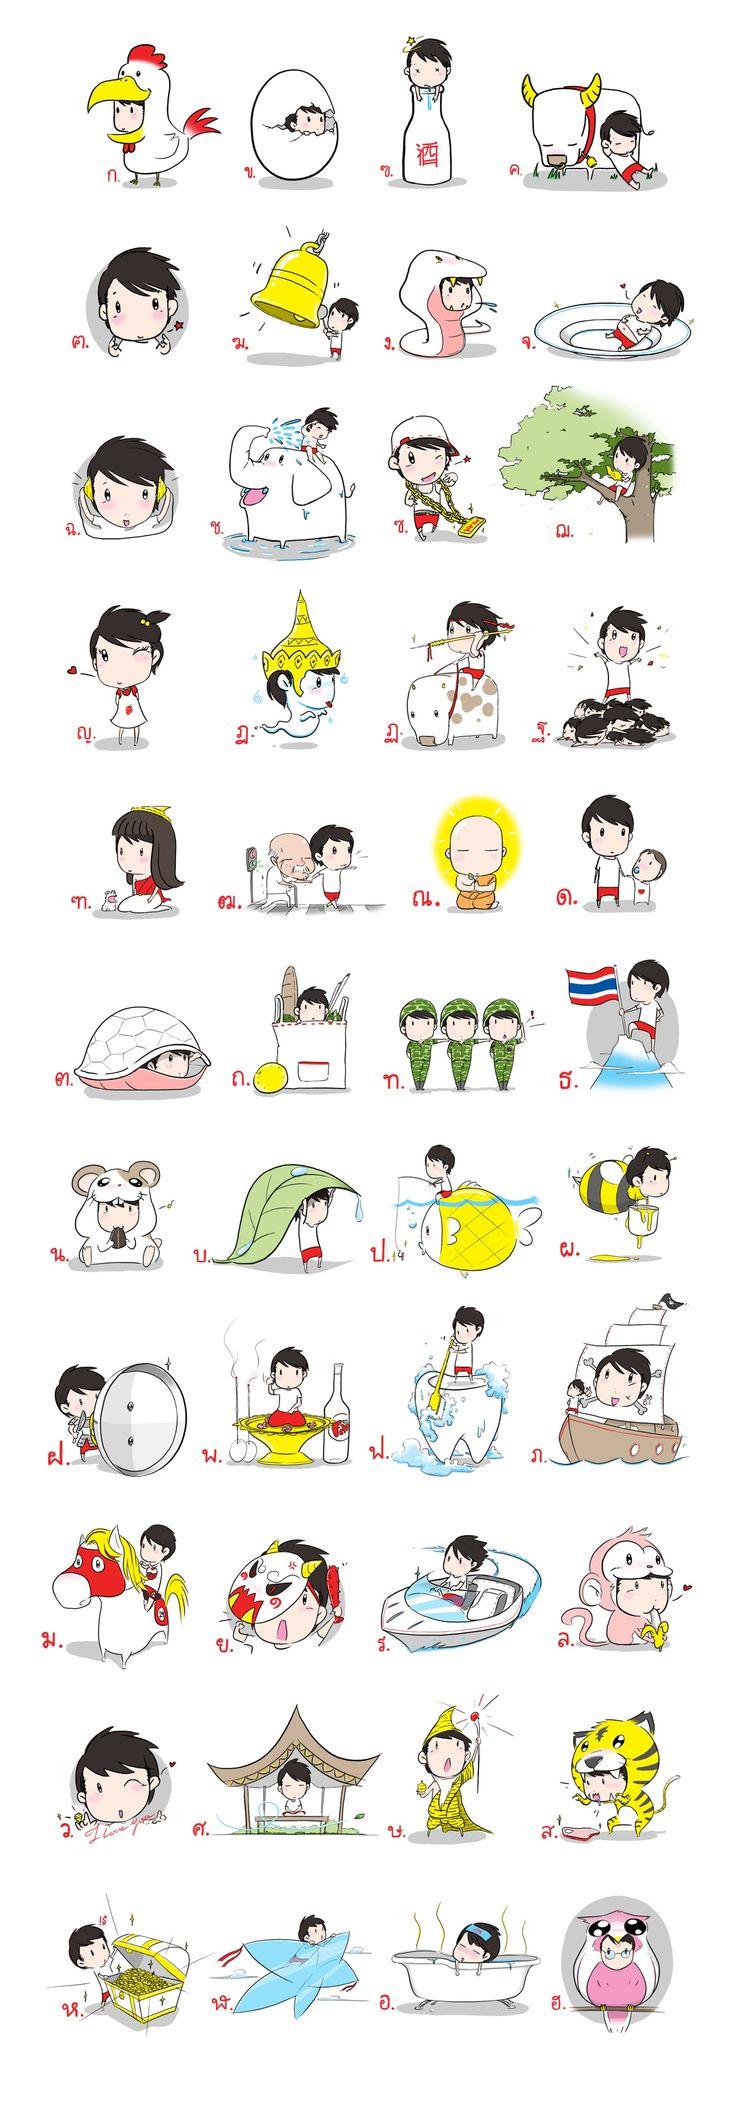 SmallUmbrella's doodle ร่มเล็กท่องหนังสือ(ภาษาไมย)ก-ฮ ( all 44 Thai alphabets )